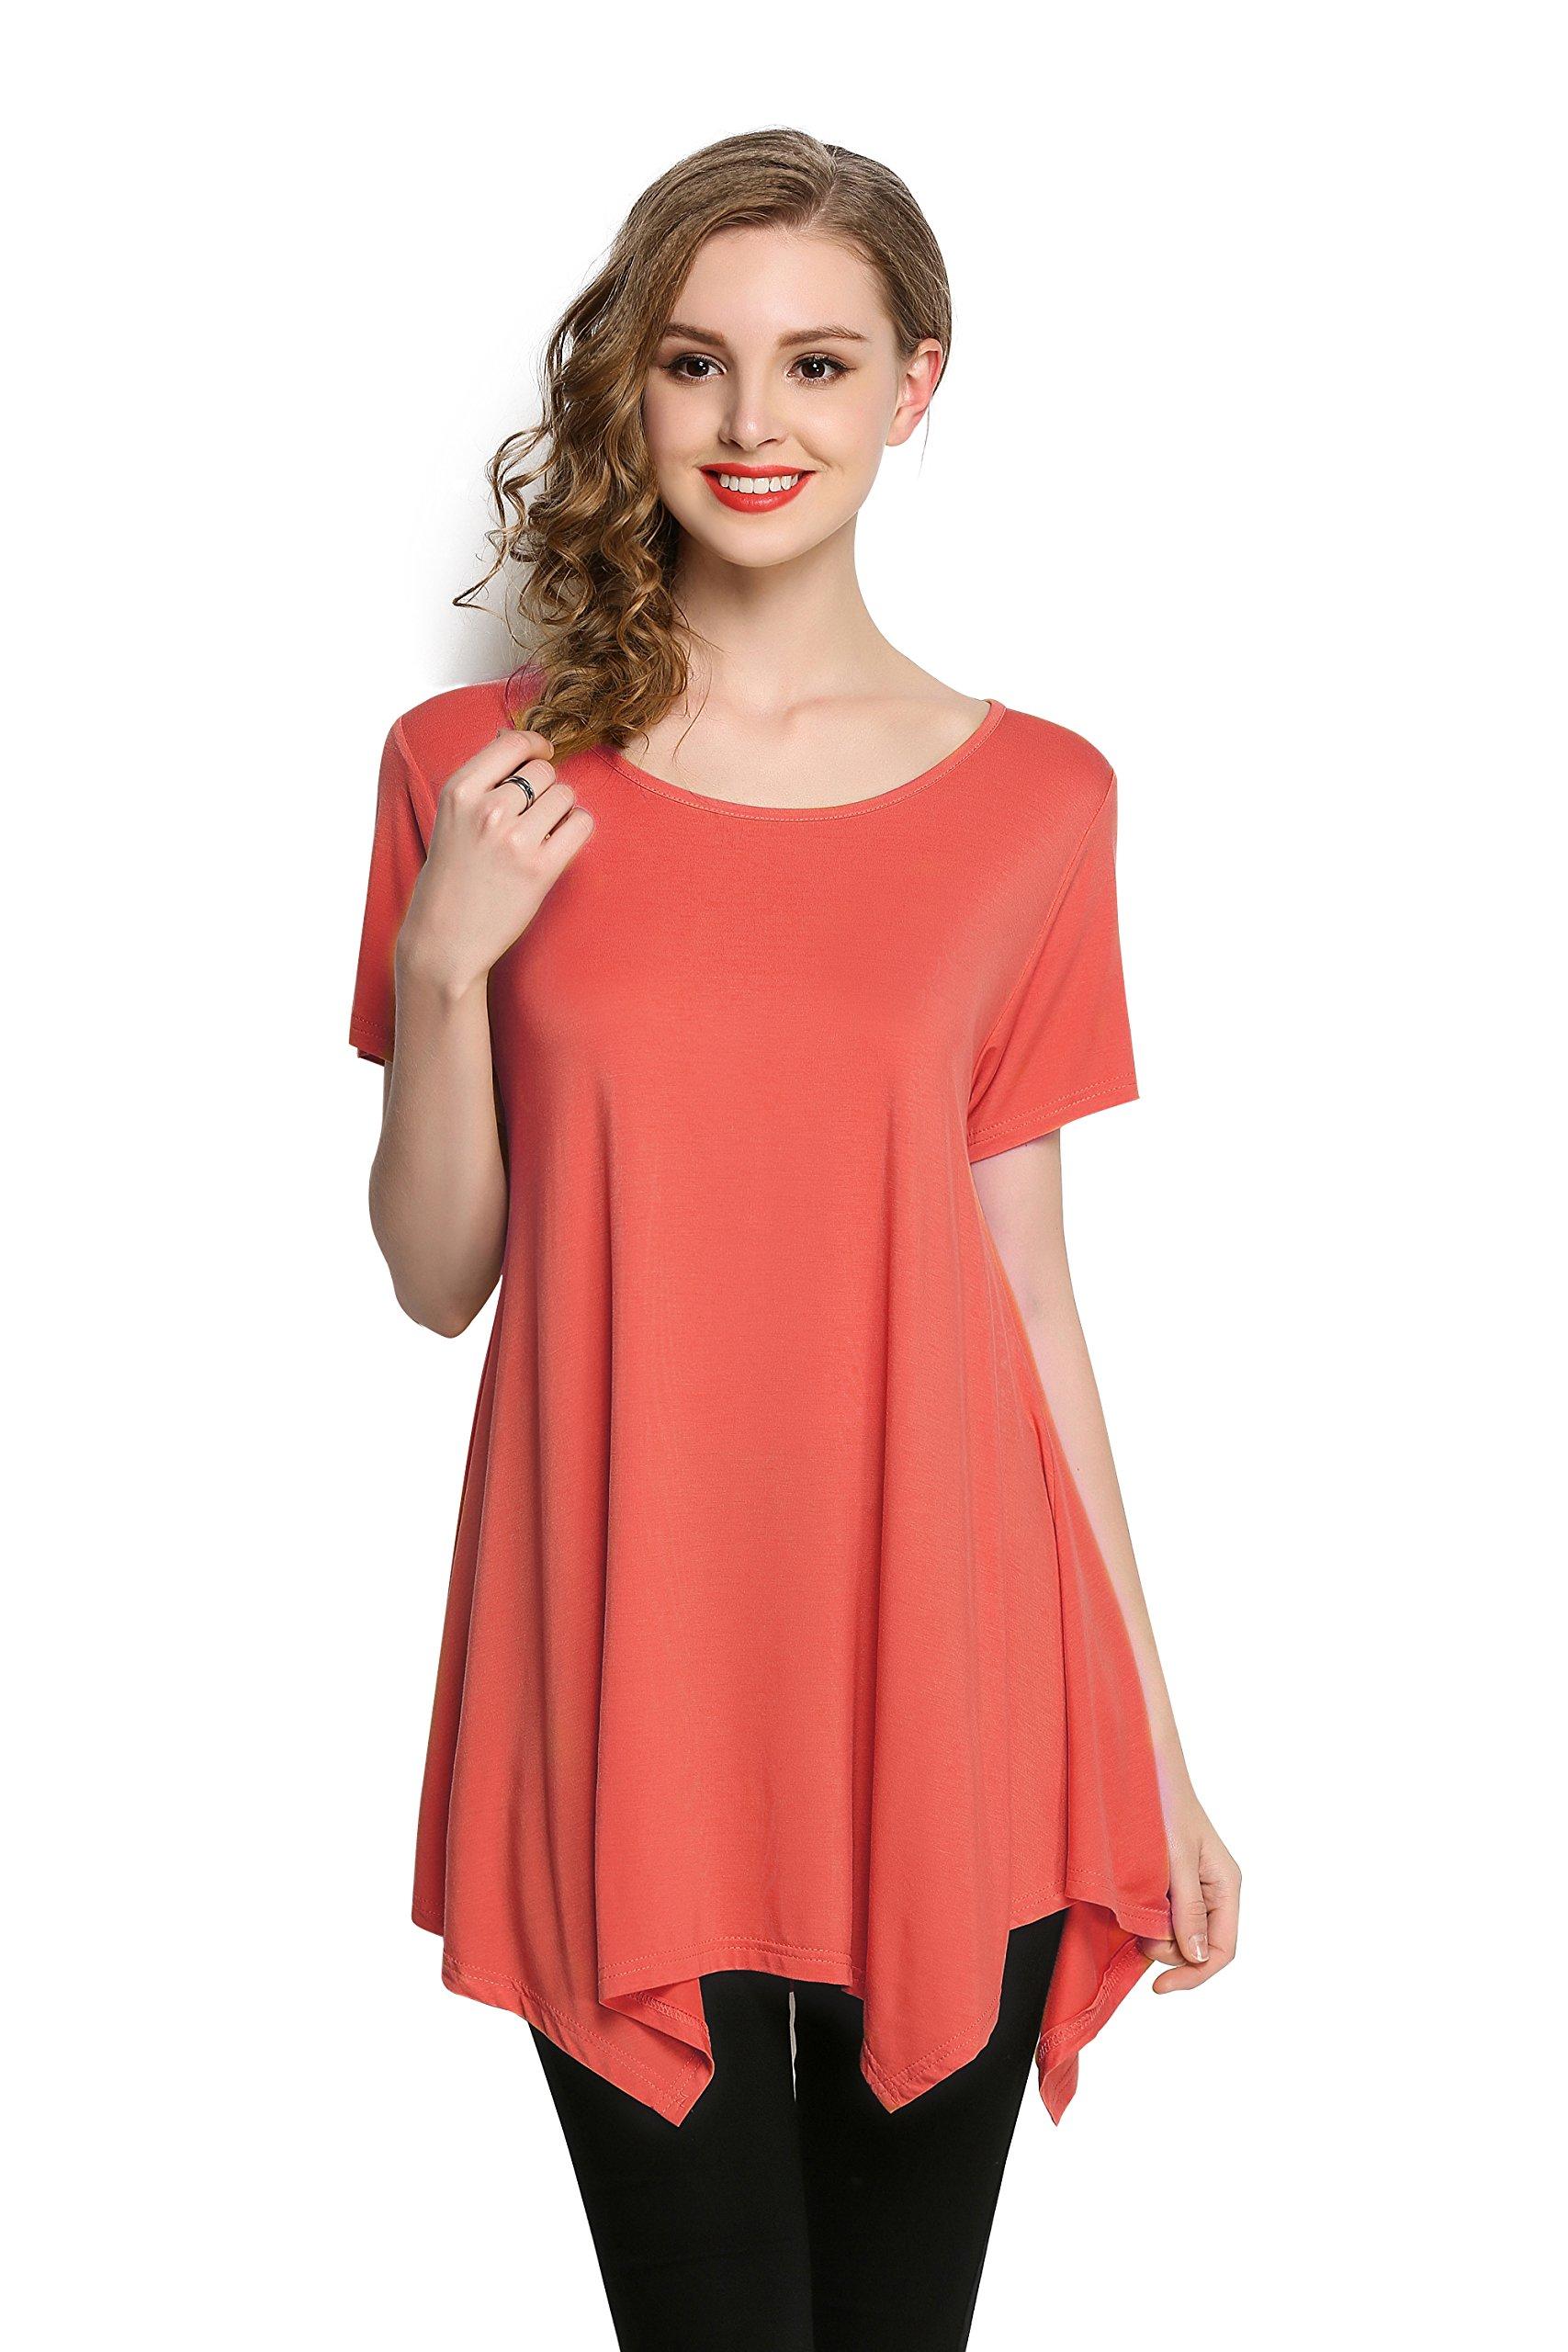 a93ea3daac7 LARACE Womens Swing Tunic Tops Loose Fit Comfy Flattering T Shirt (M,  Watermelon). by LARACE